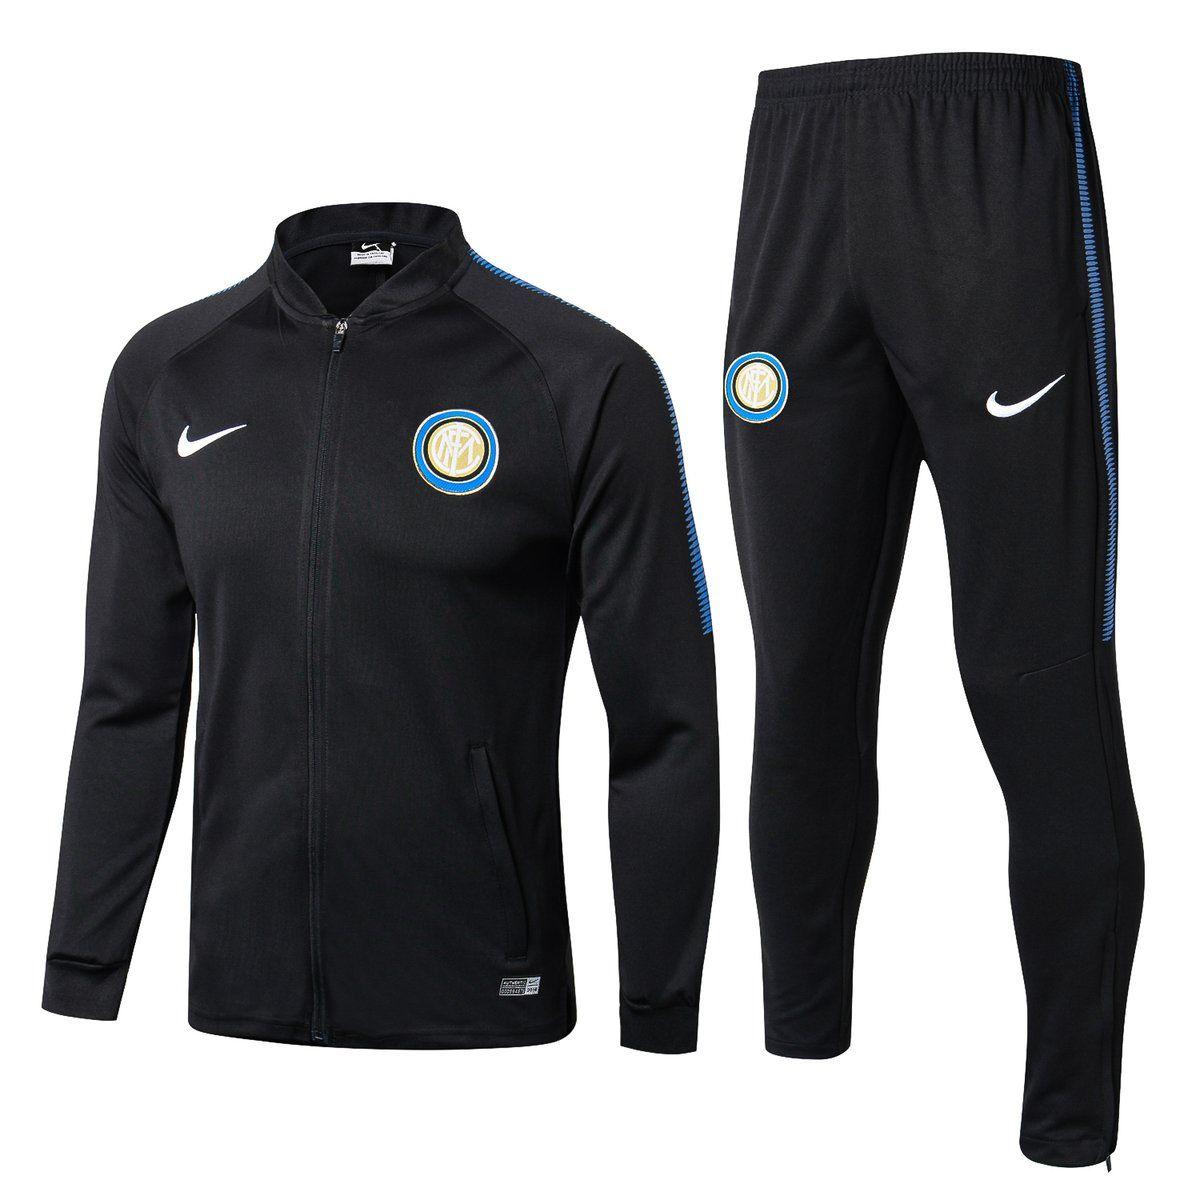 Inter Milano Black Mens Training Sports Jersey Tracksuit Jacket Sets